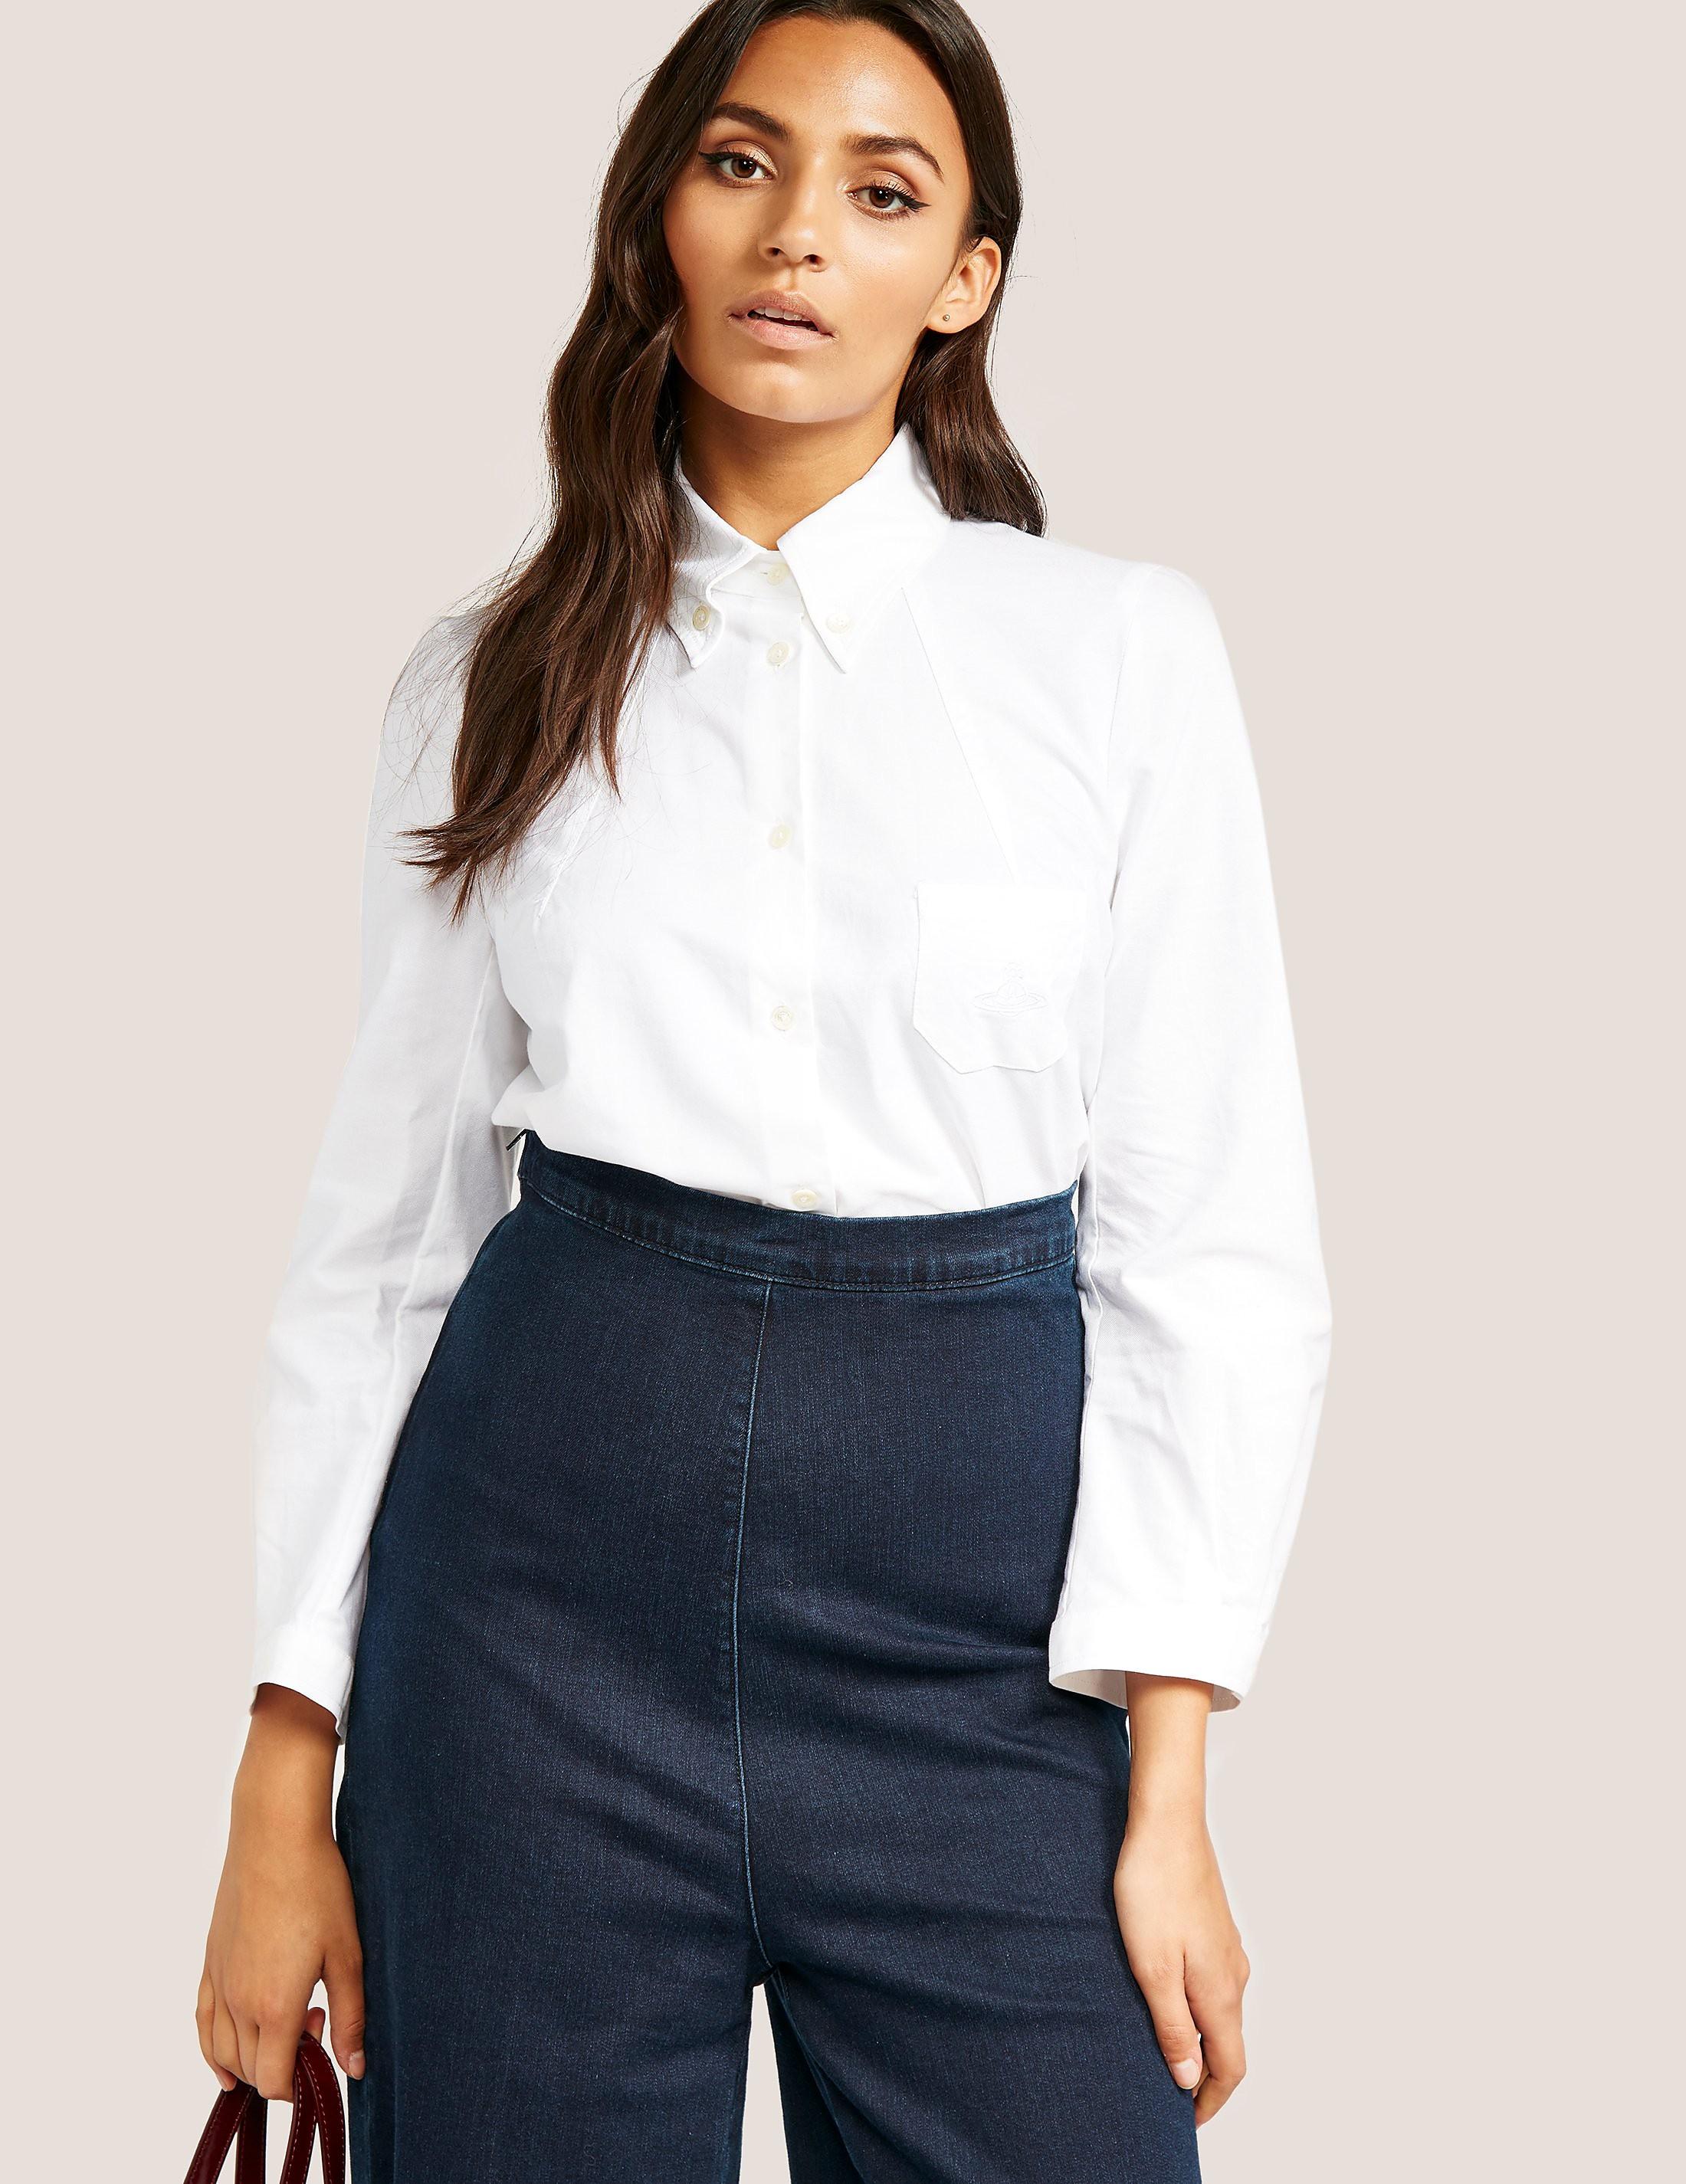 Vivienne Westwood Anglomania Plain White Shirt